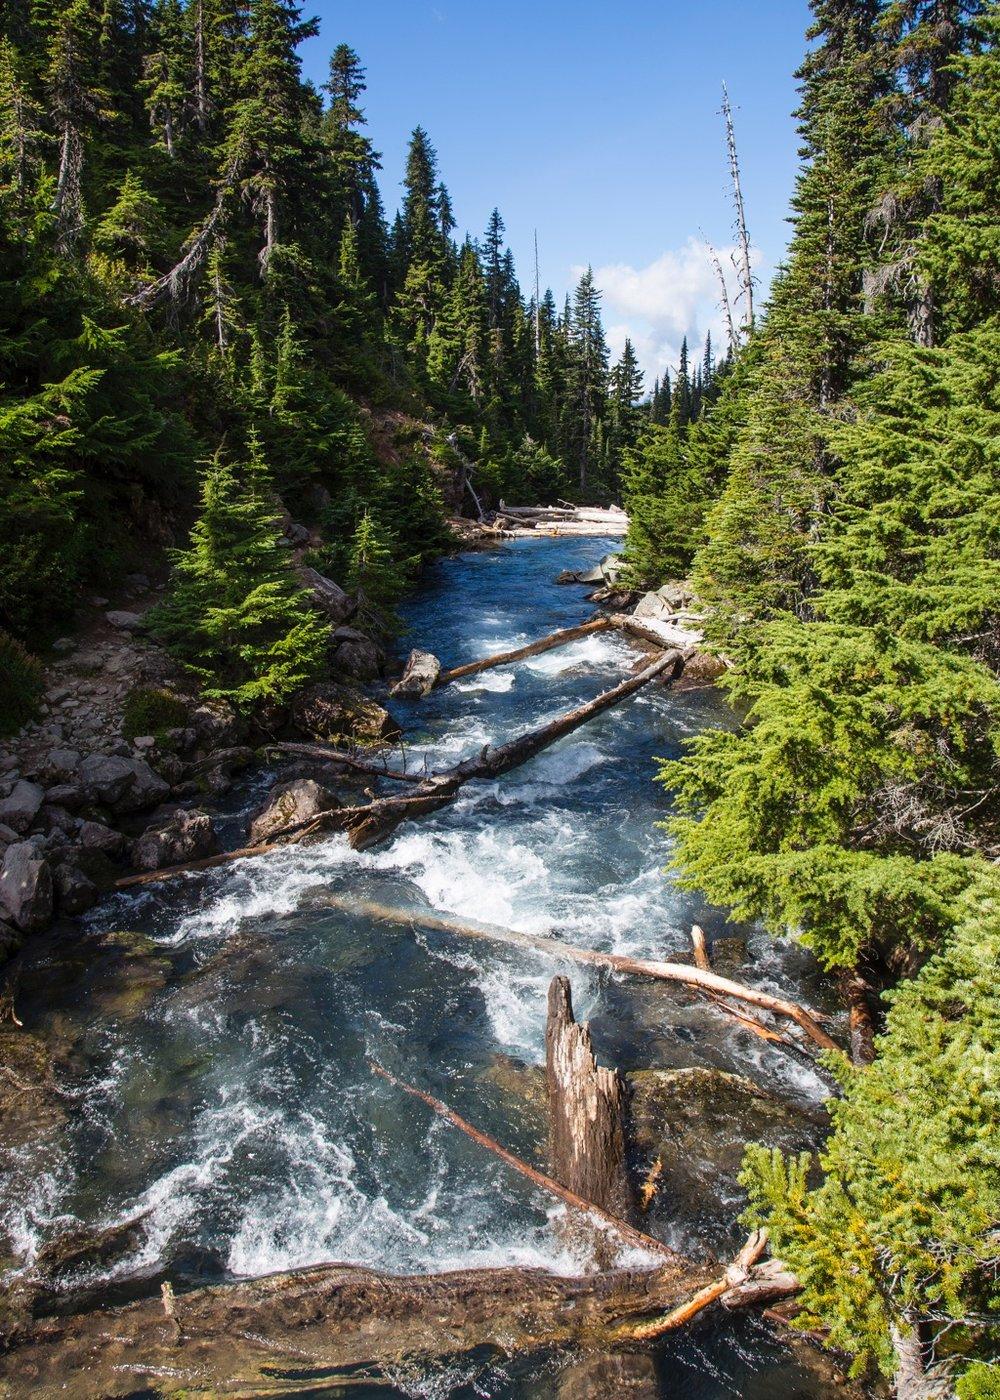 We had to cross over a bridge where a river empties Garibaldi Lake down to Lesser Garibaldi Lake.